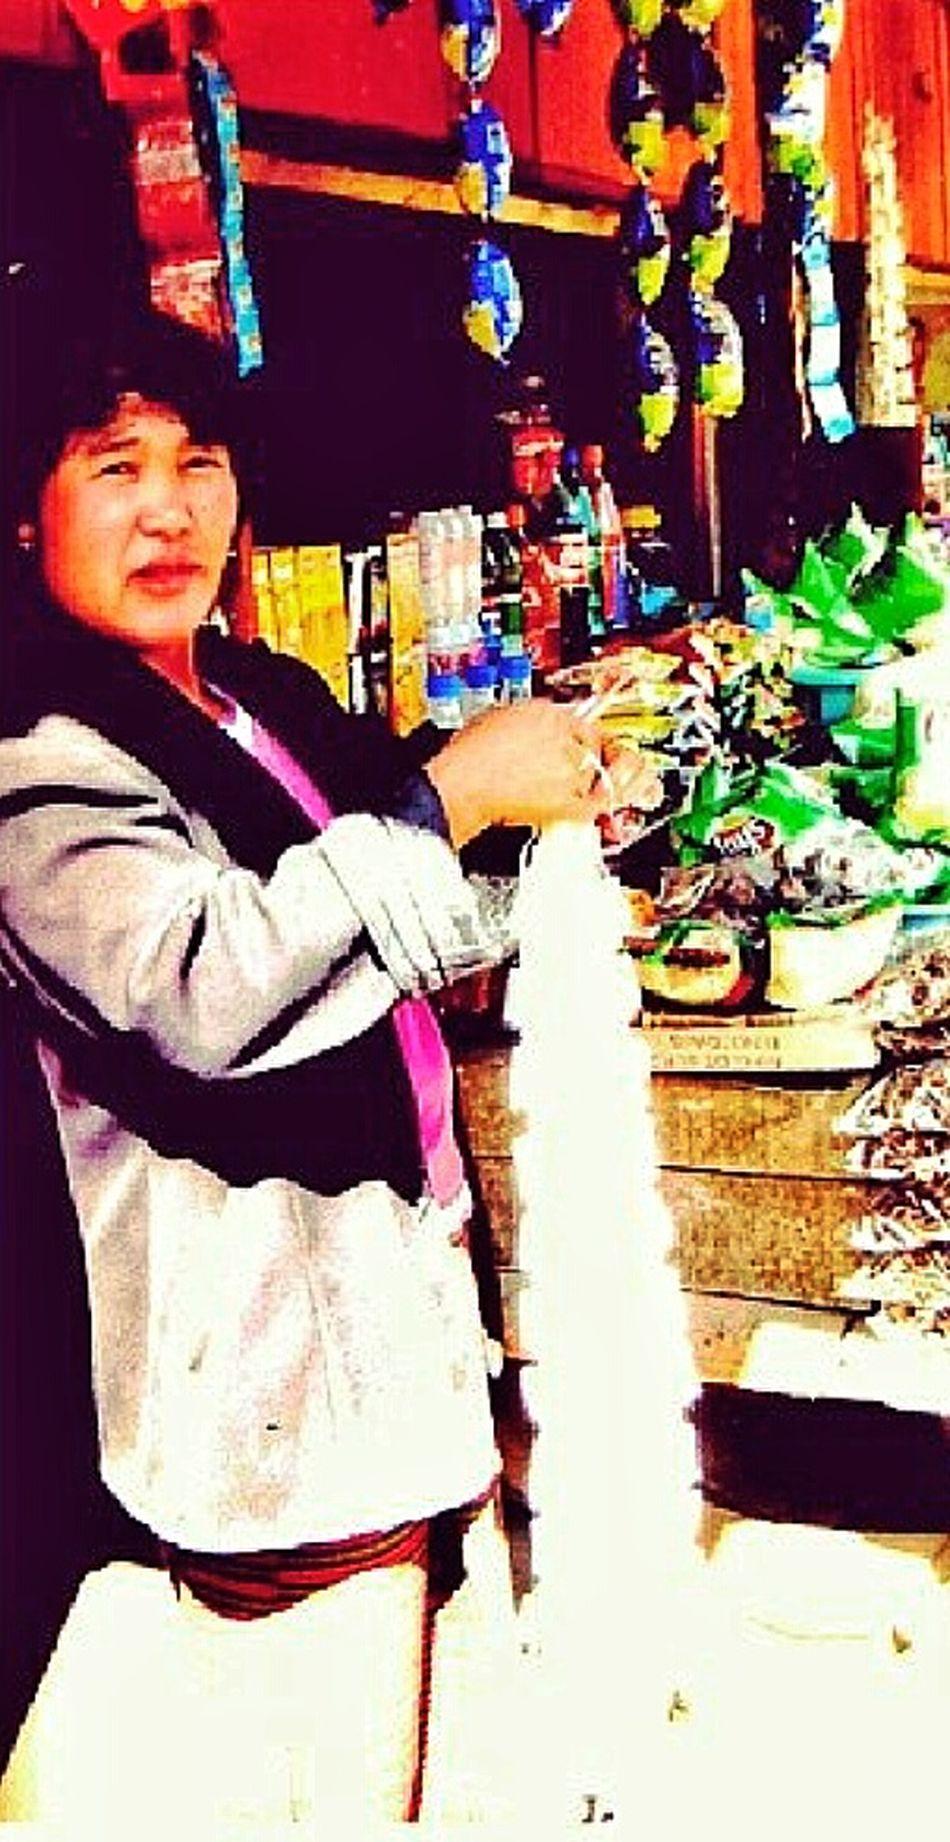 Provision Shop Owner Bhutan Himalayas